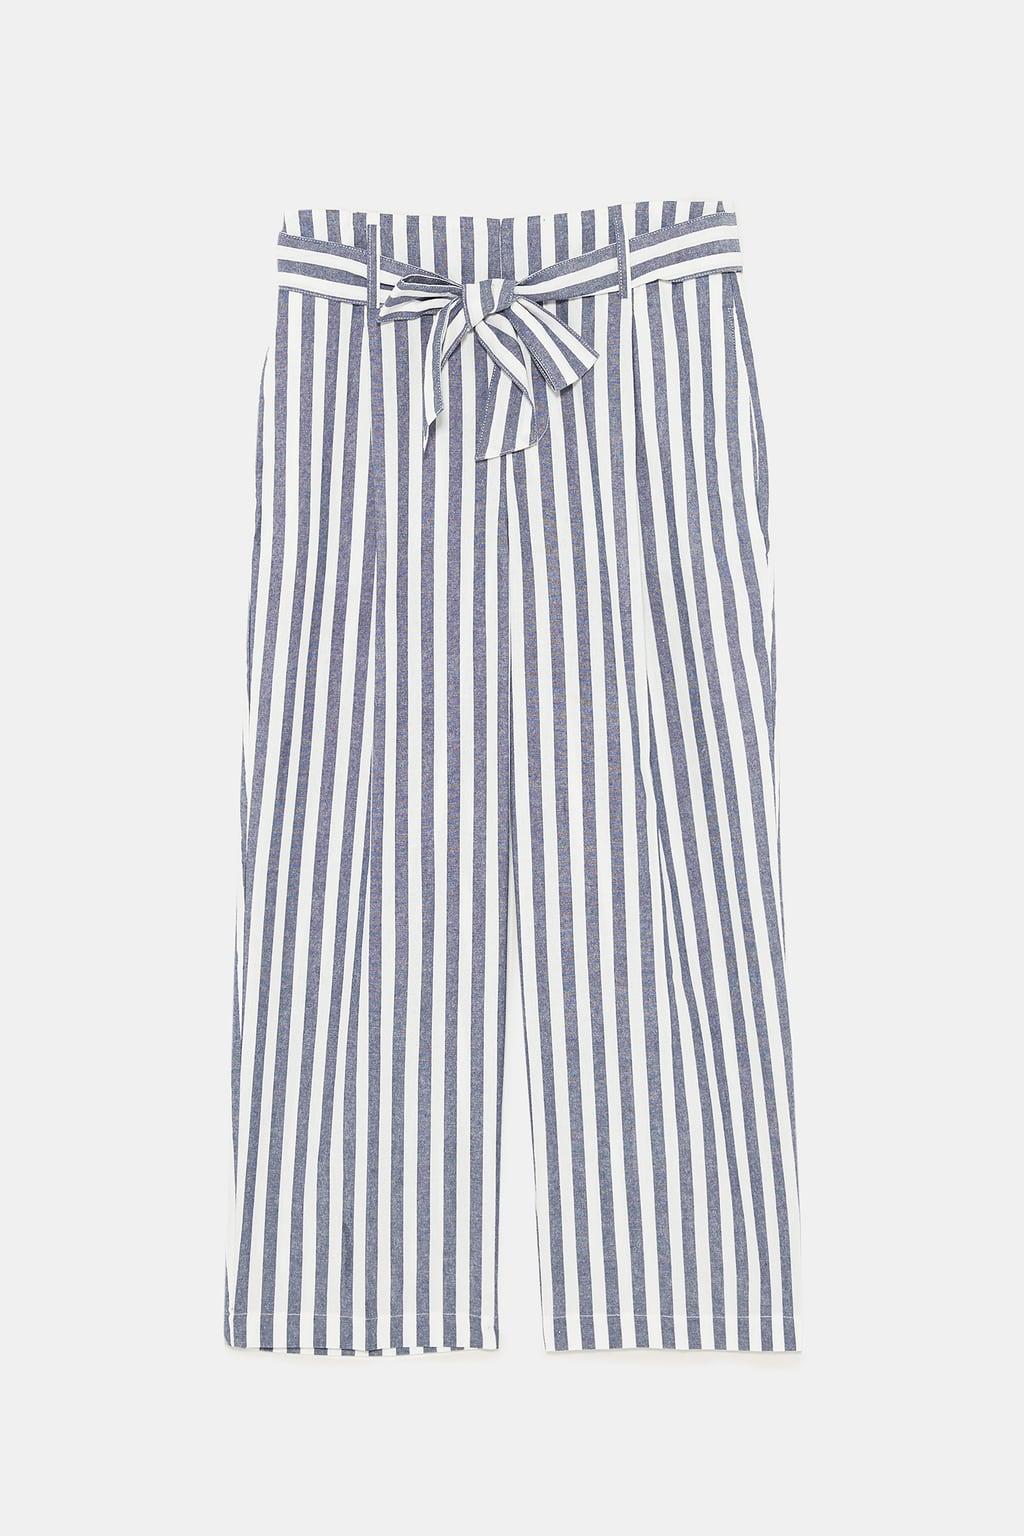 - High waist pants with self belt. Front pleats. Side pockets and false back welt pocket. Front zipper and metal hook closure. $39